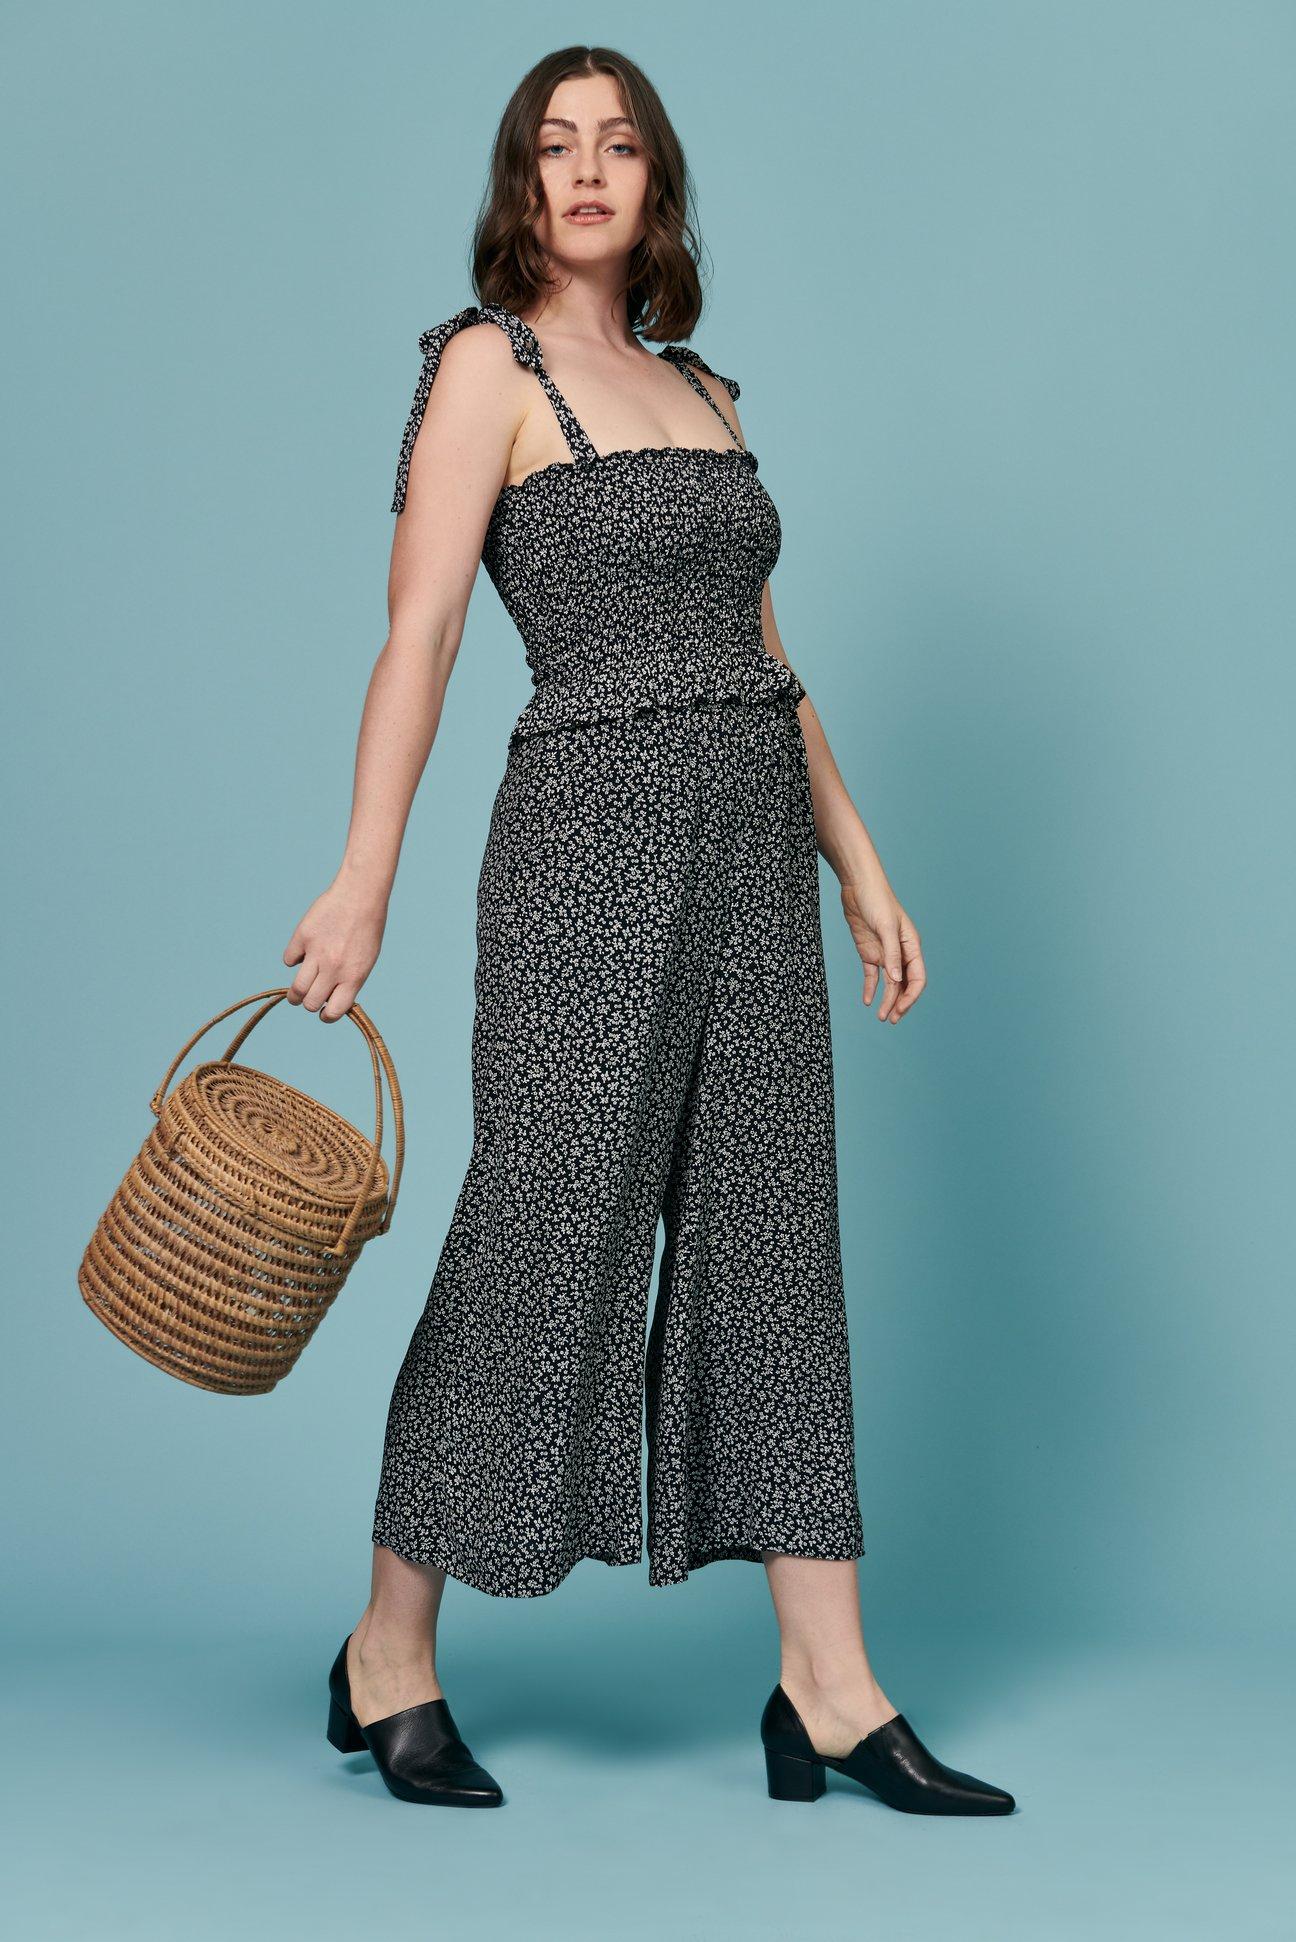 California Chic Fashion // Whimsy + Row